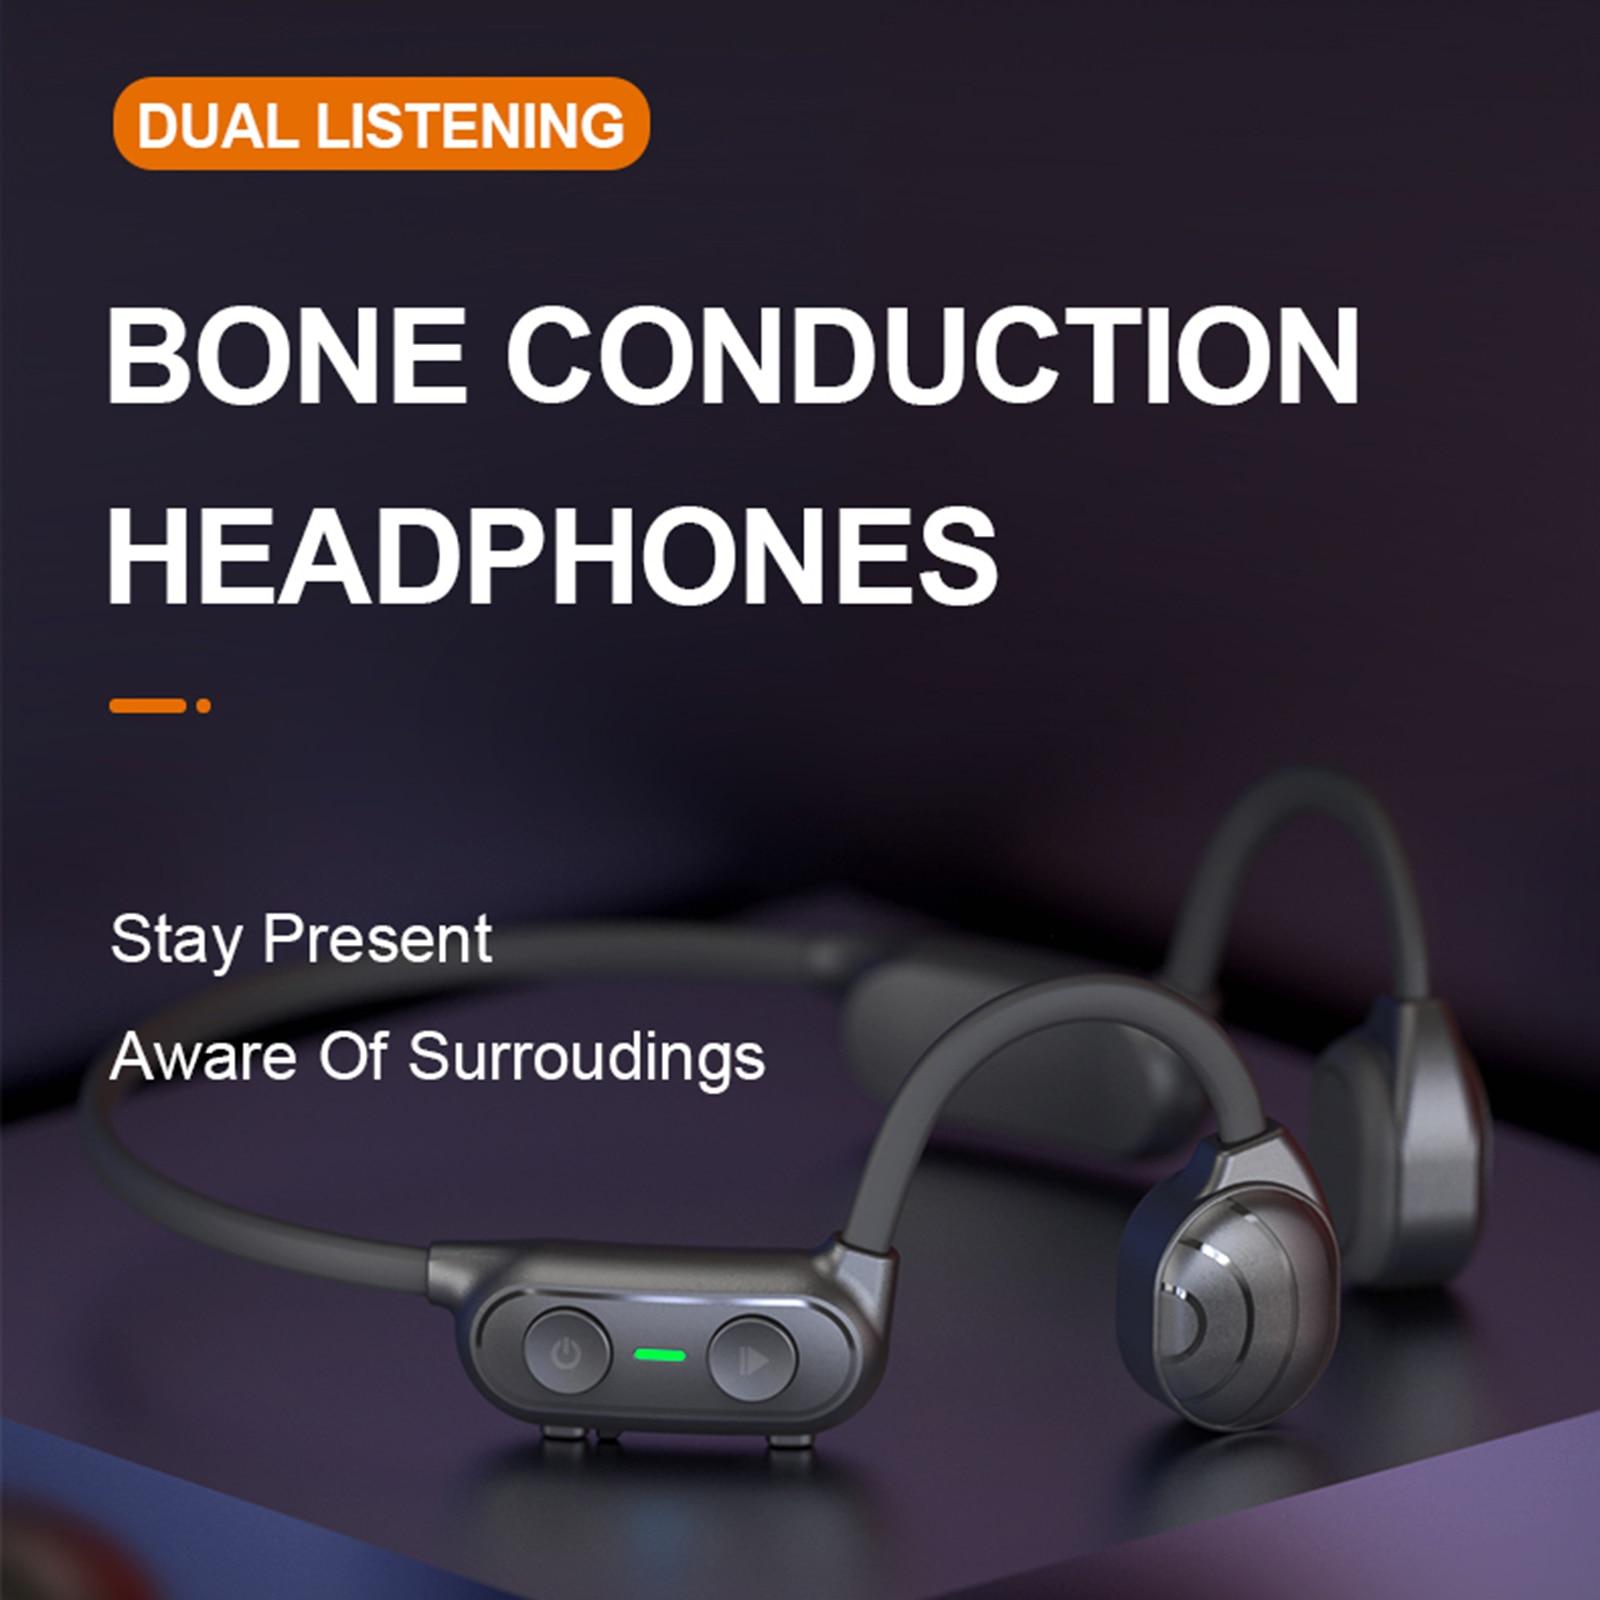 New Bluetooth Wireless Headphones Waterproof Open Ear Bone Conduction Headphones Hifi Stereo Sport Hands-free Headset with mic enlarge